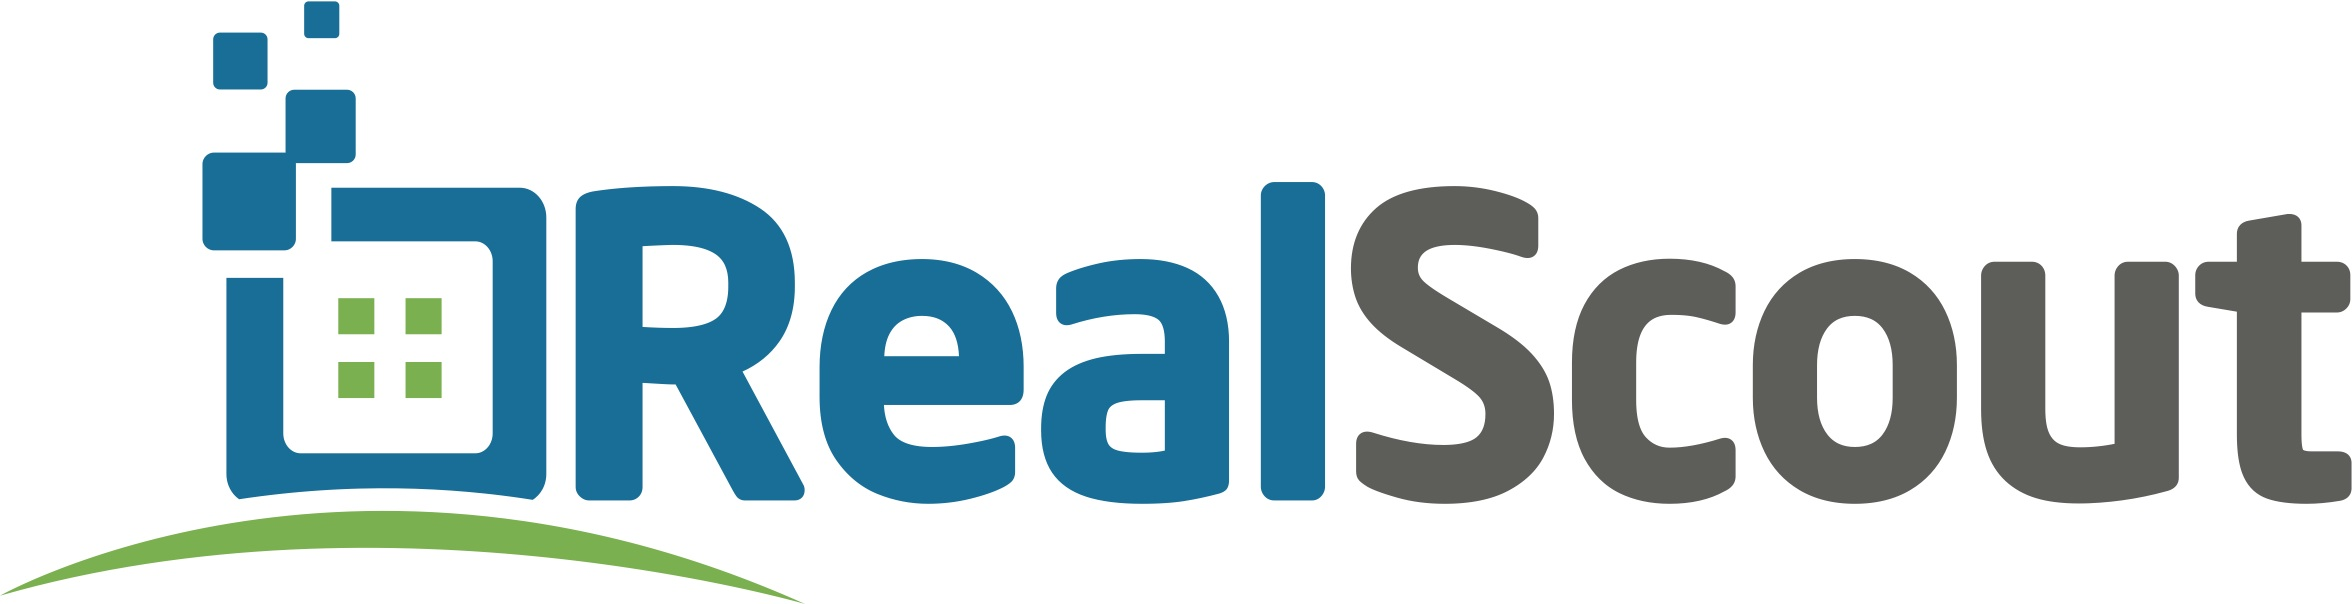 realscout_logo.jpg